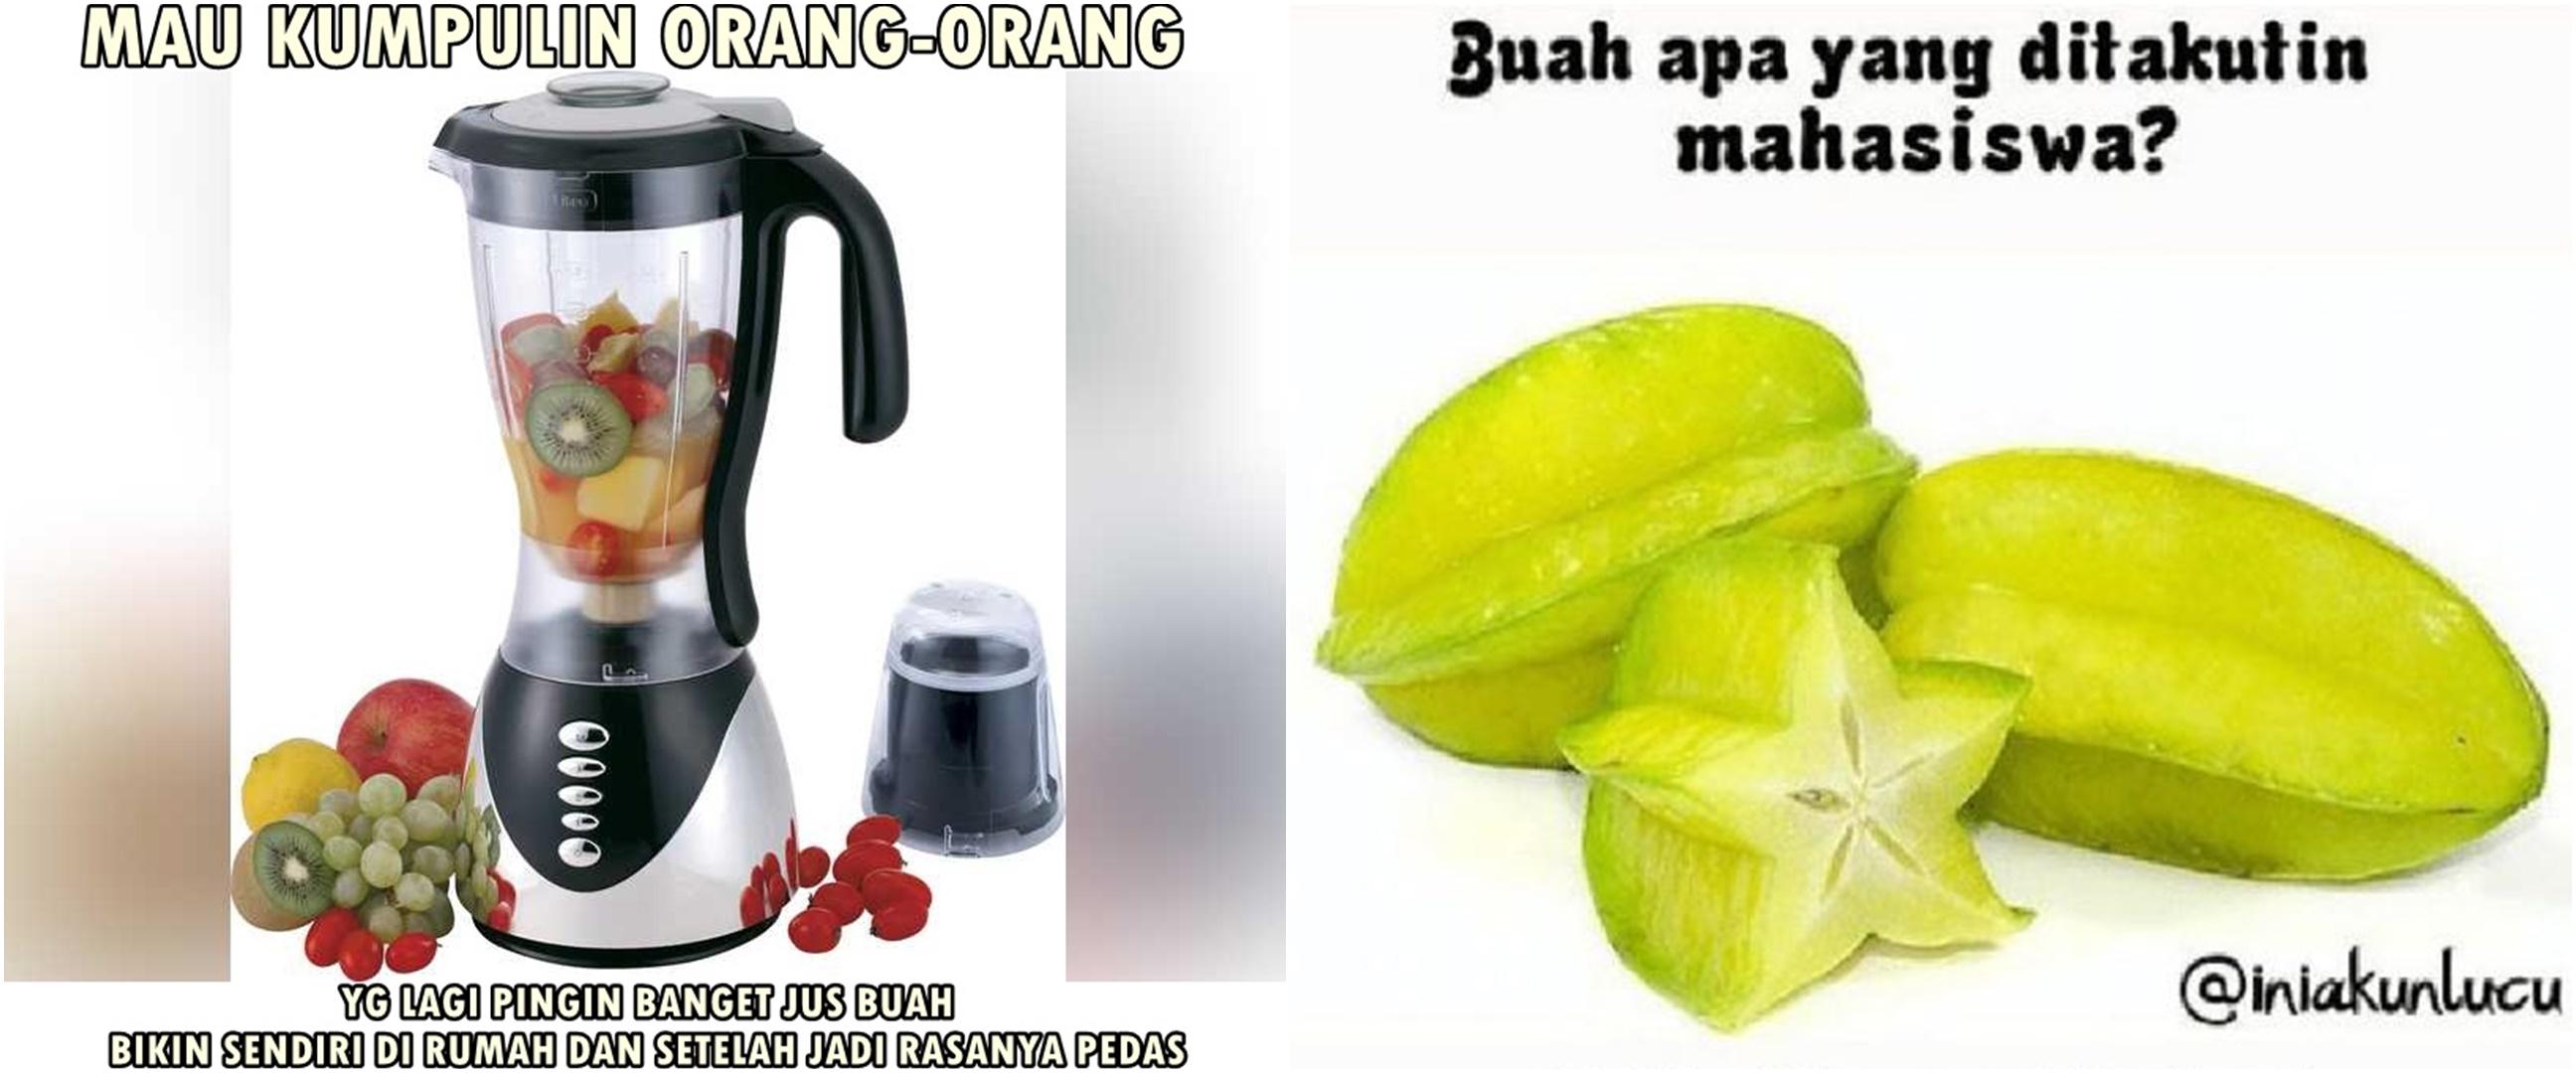 10 Meme lucu ala buah-buahan ini bikin senyum kecut